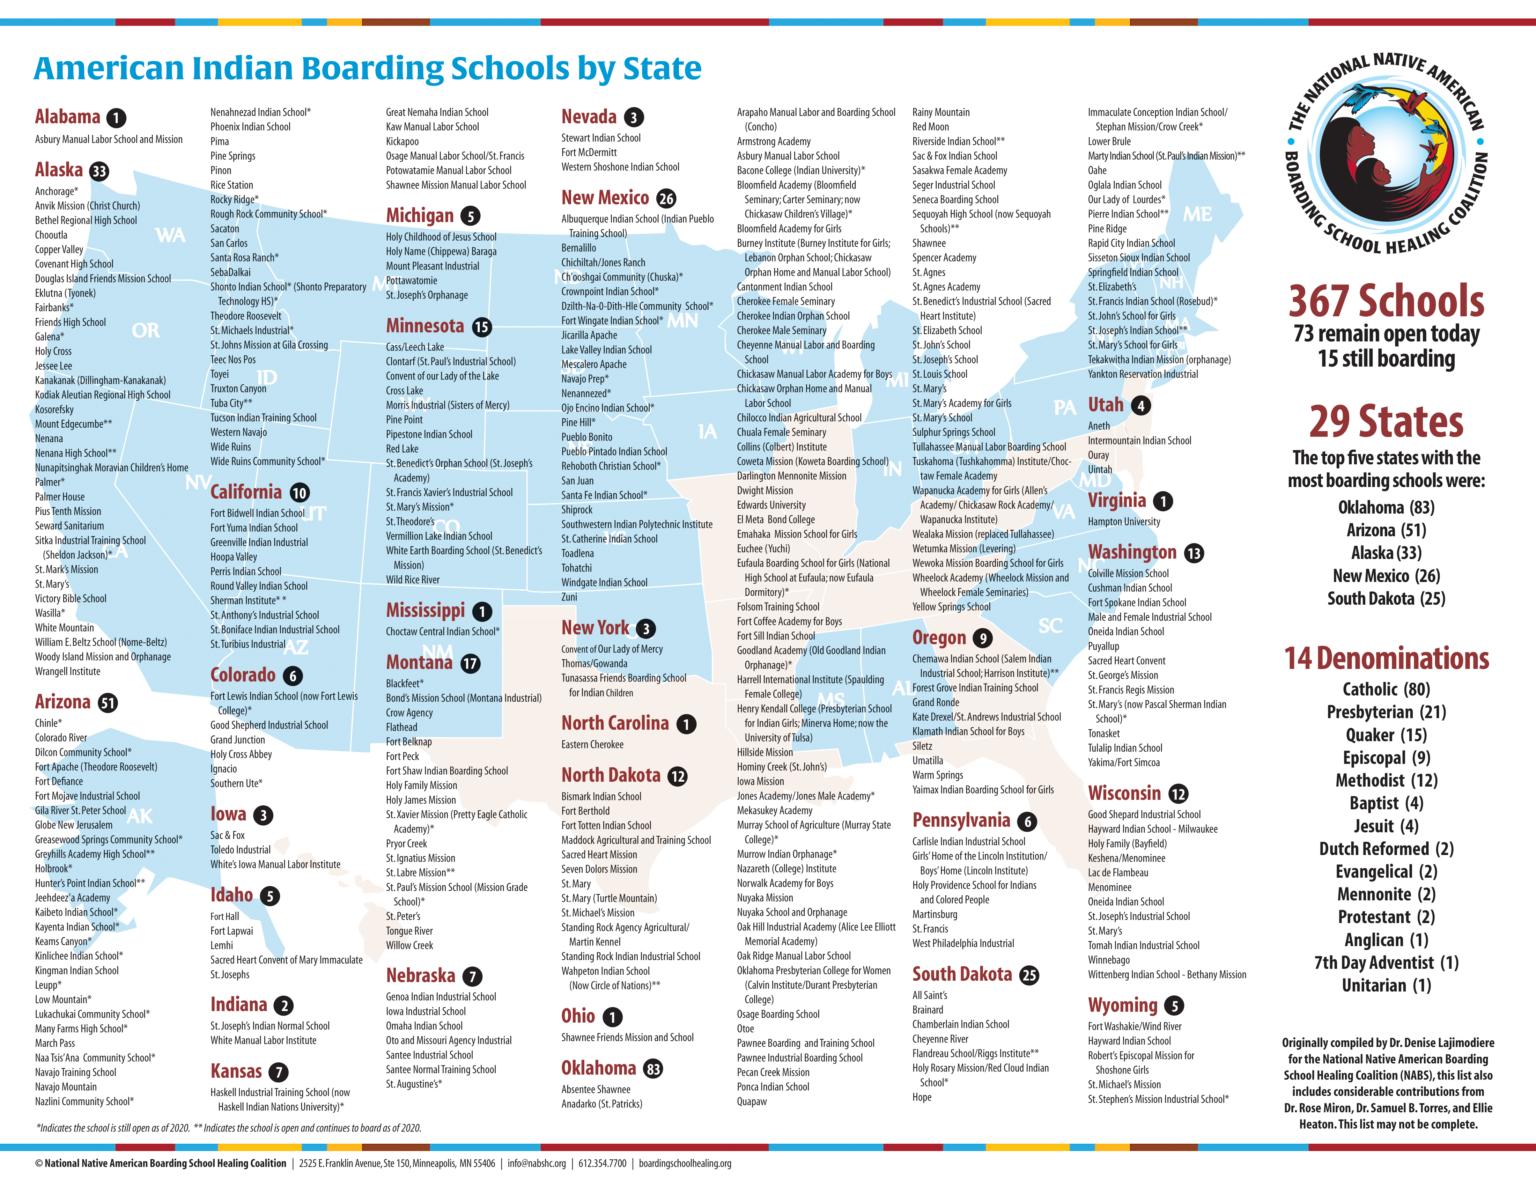 Source: National Native American Boarding School Healing Coalition